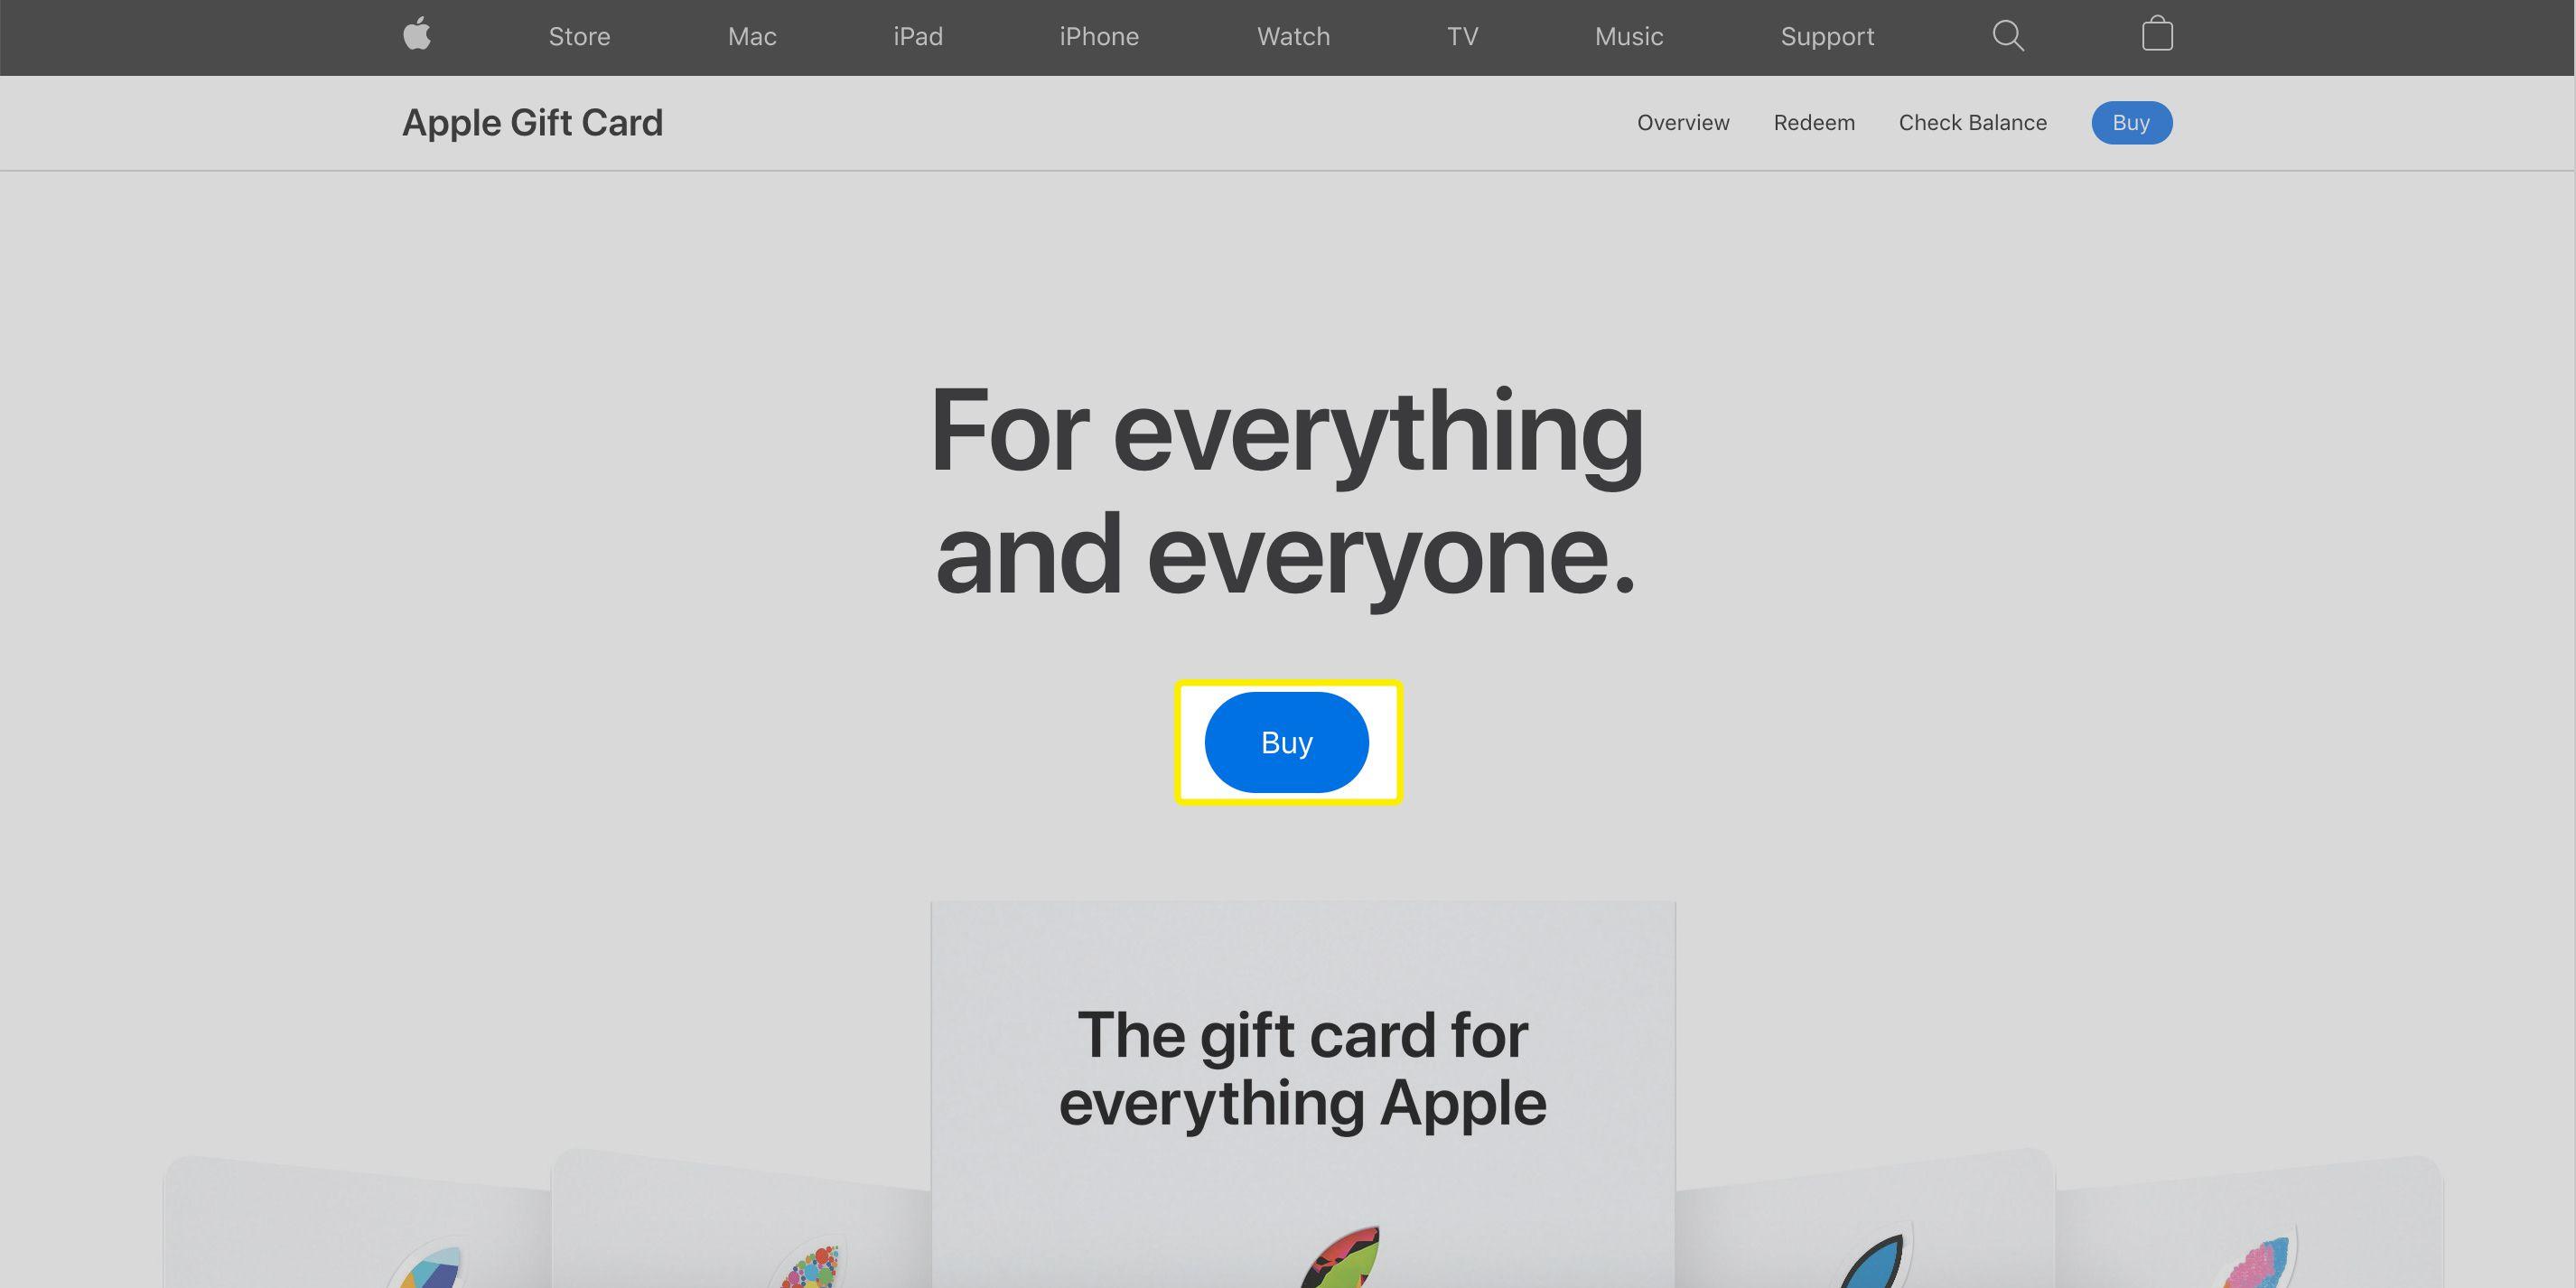 Apple Gift Card buy